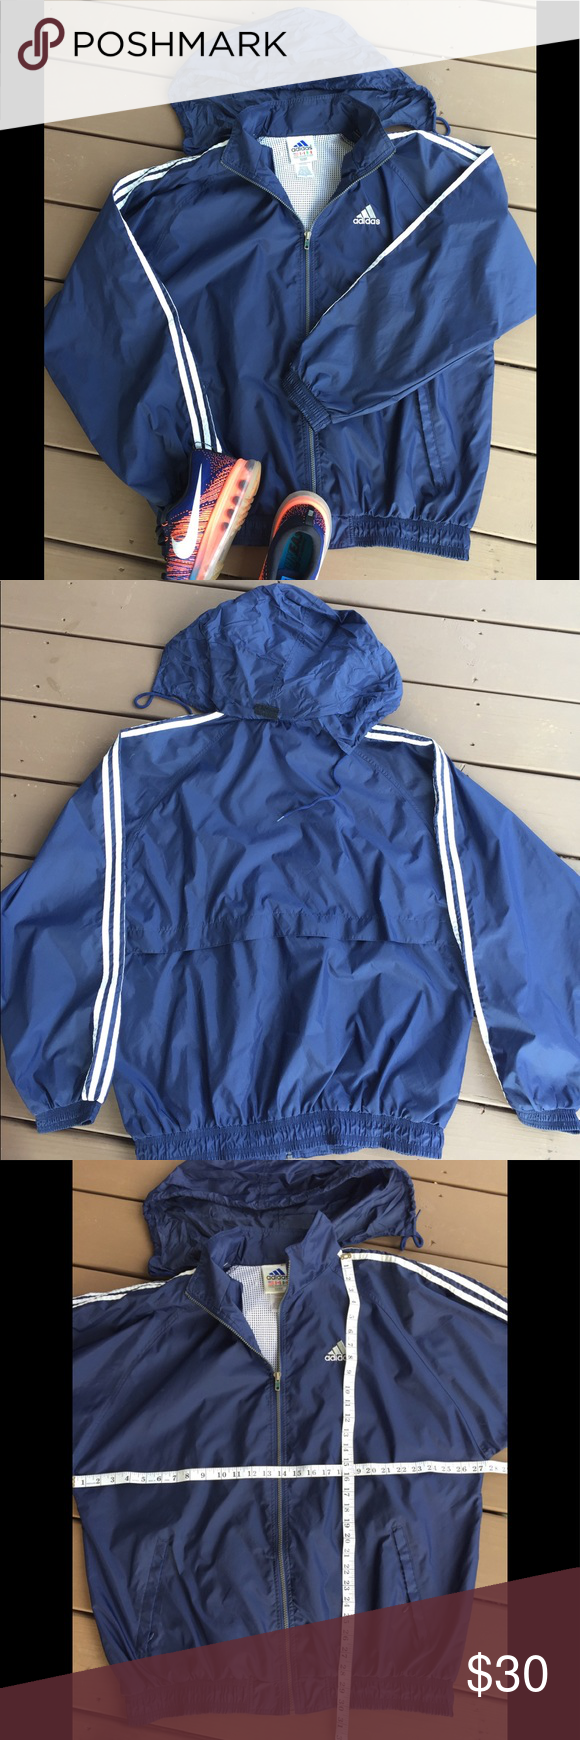 Uomini 3 strisce adidas originale giacca impermeabile antivento